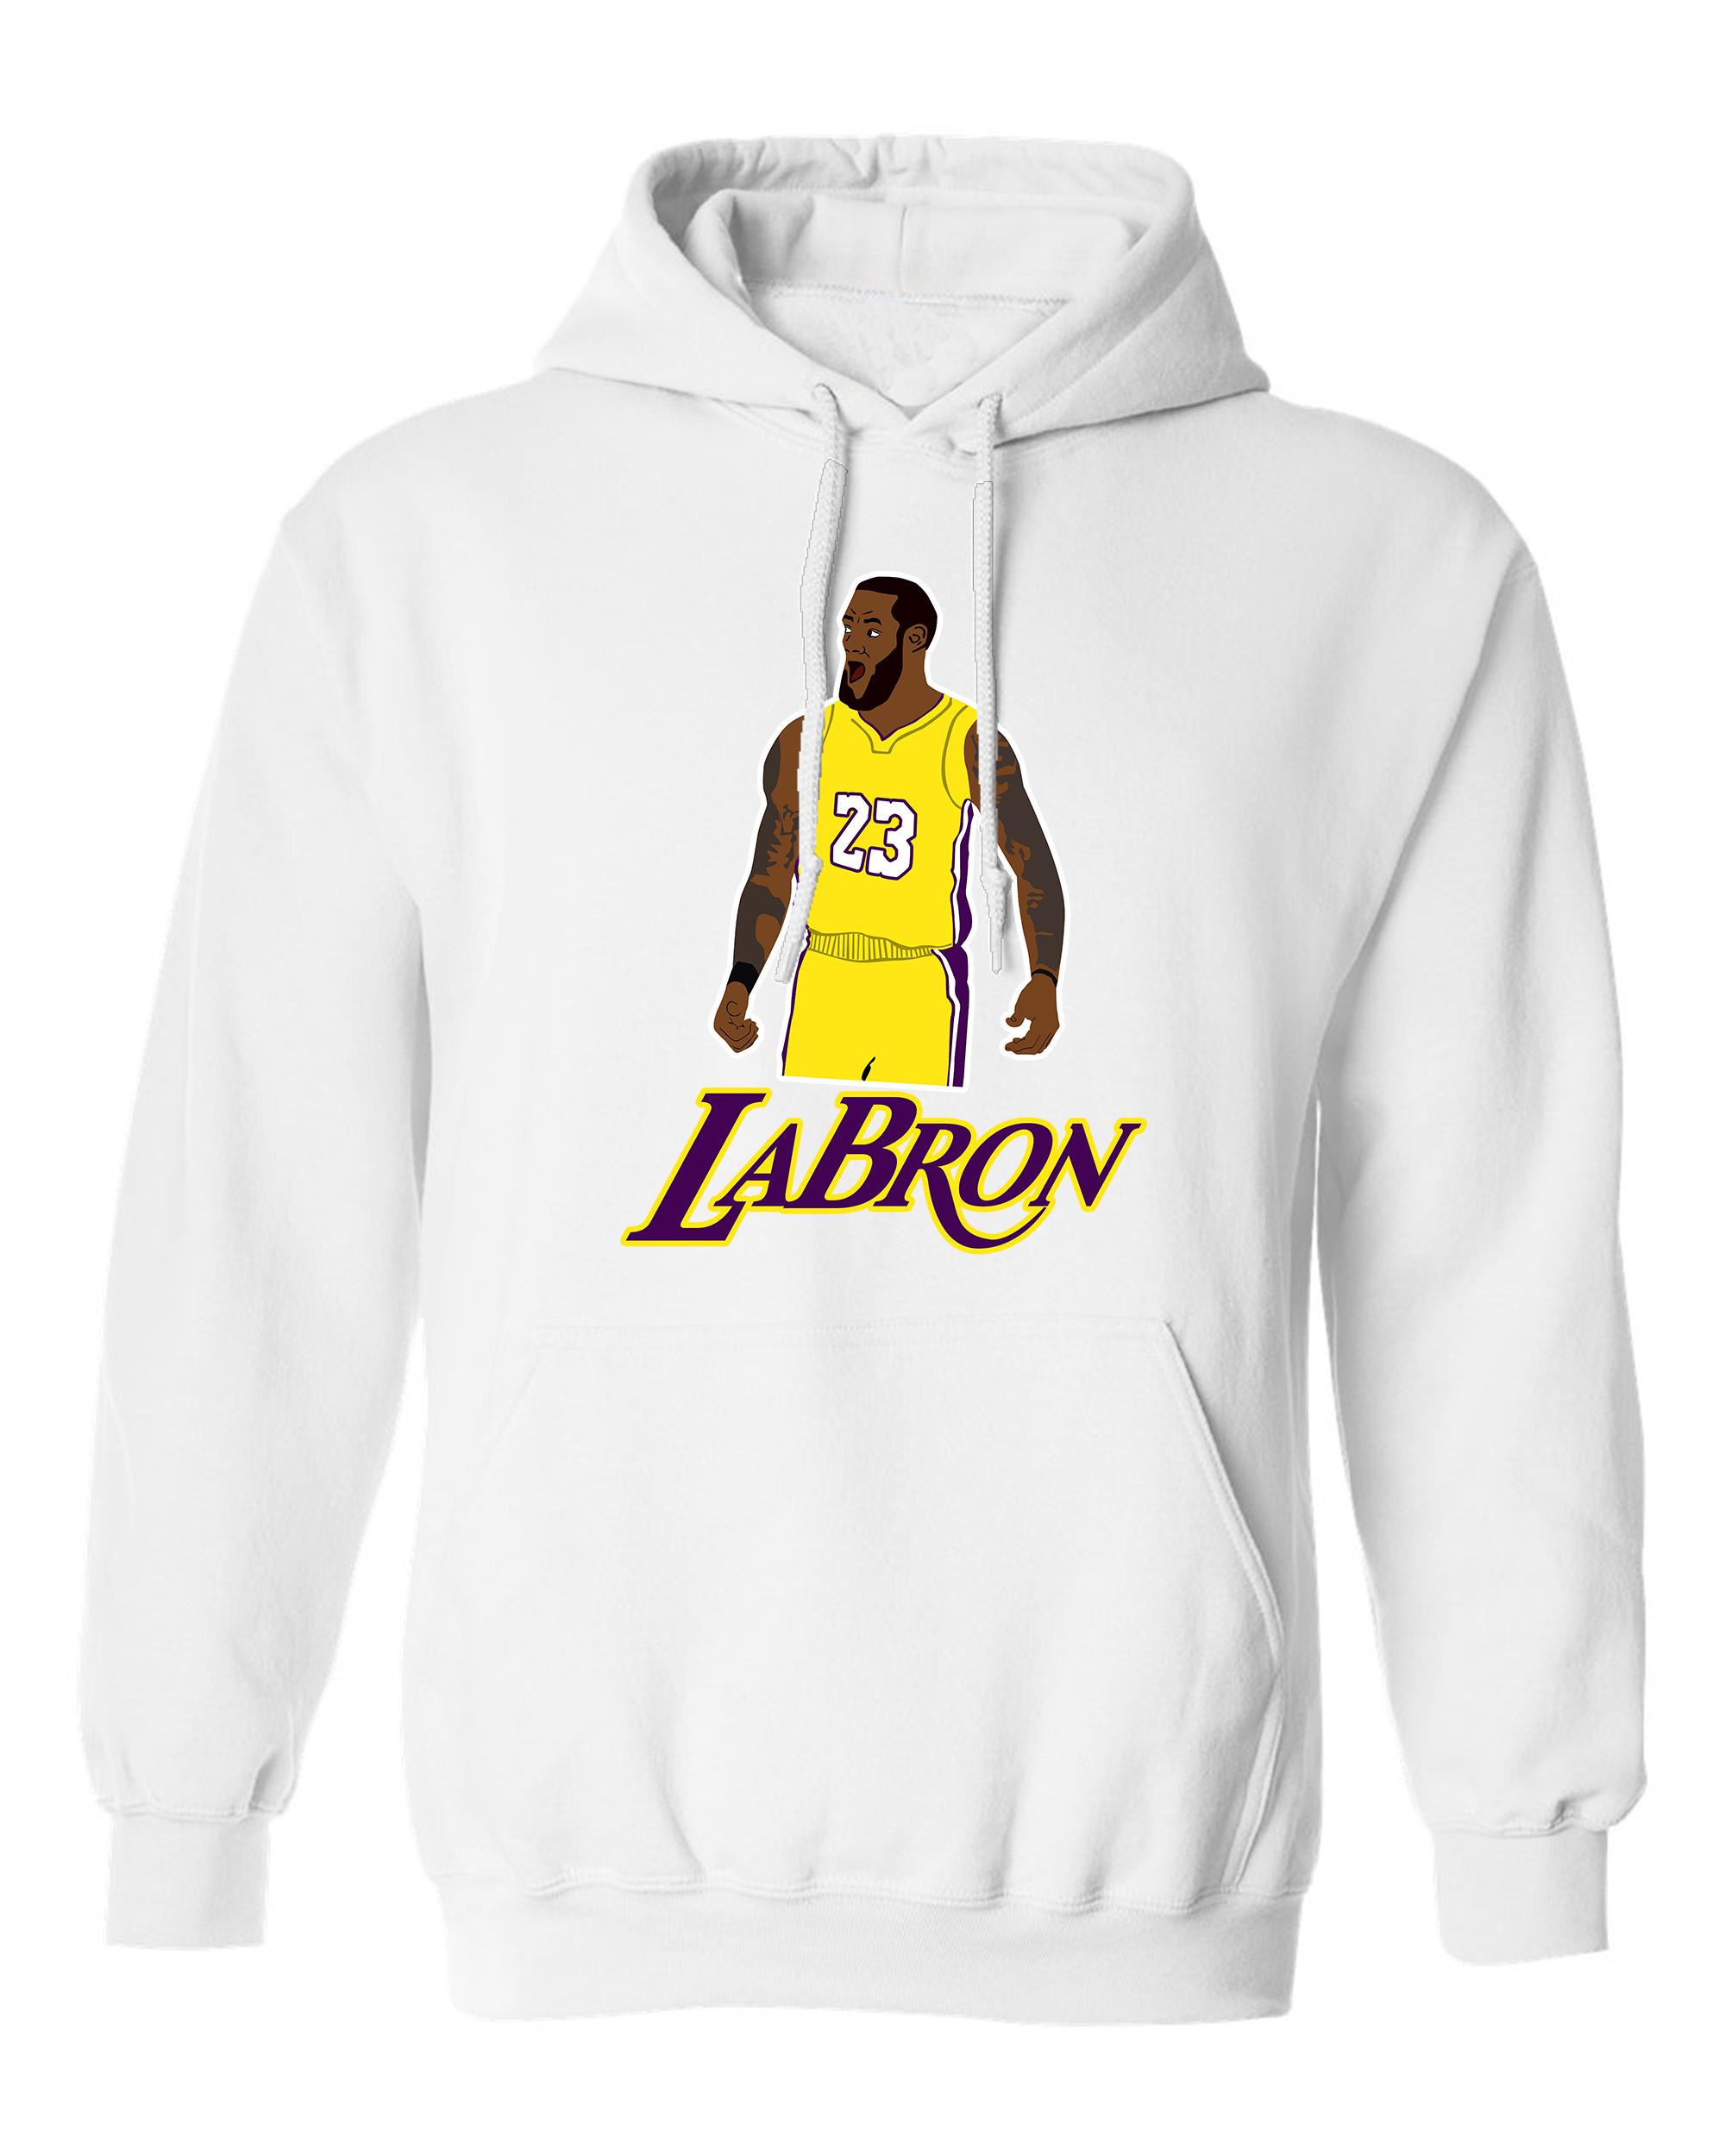 Labron The Look Lebron 23 King Los Angeles Basketball Fans DT Sweatshirt Hoodie